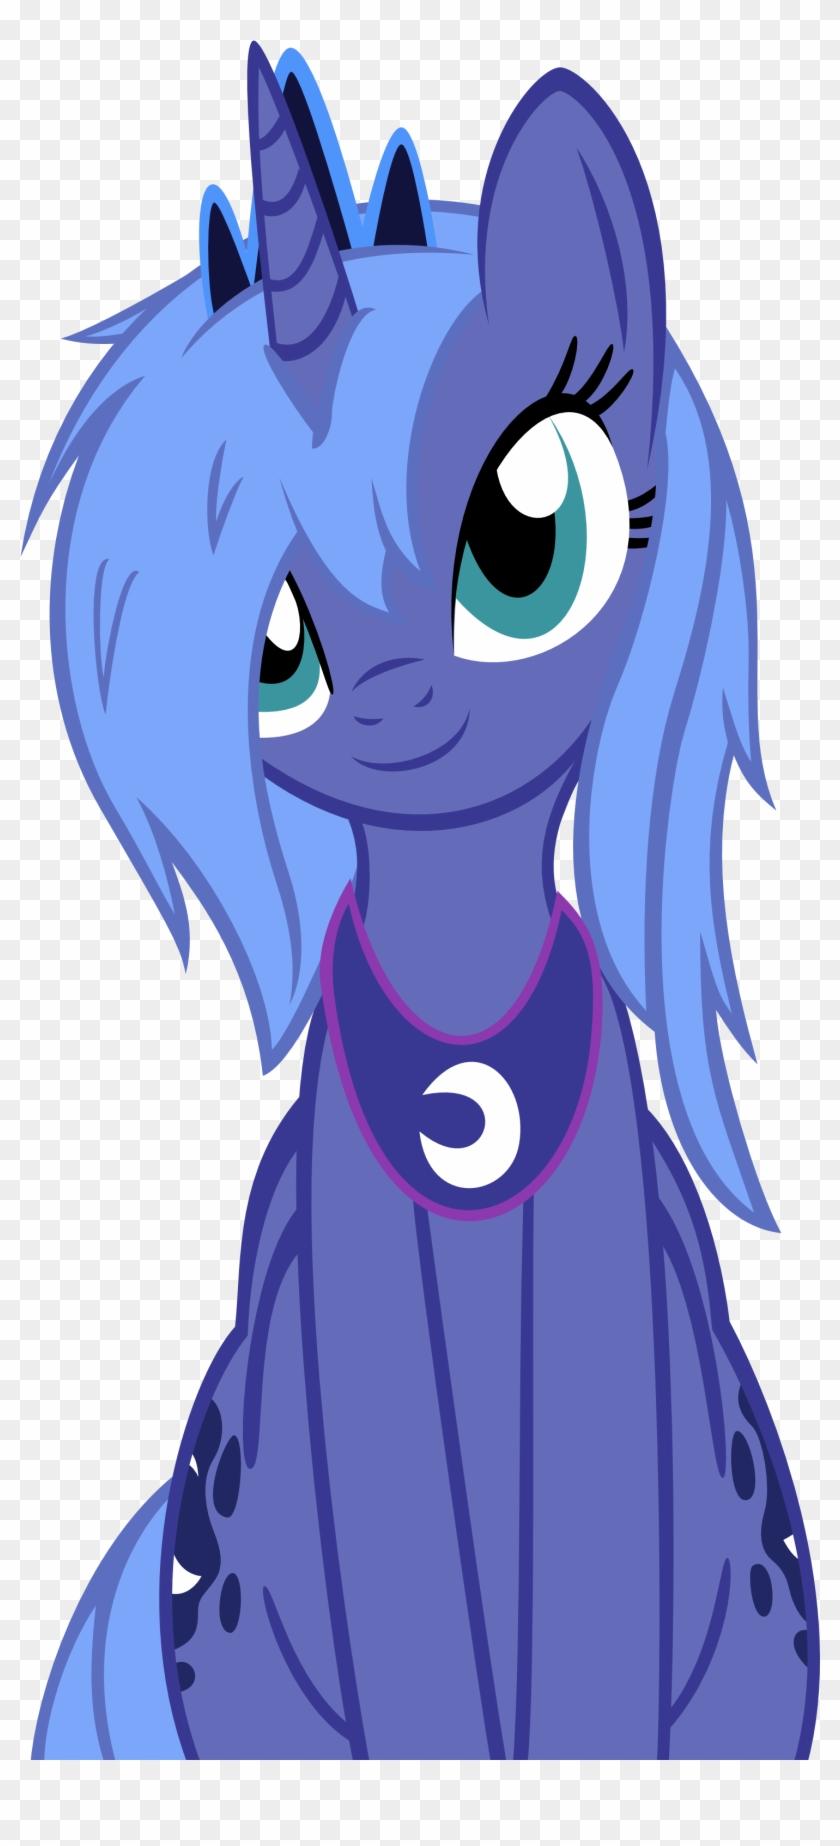 - Princess Luna Twilight Sparkle Rainbow Dash Princess - My Little